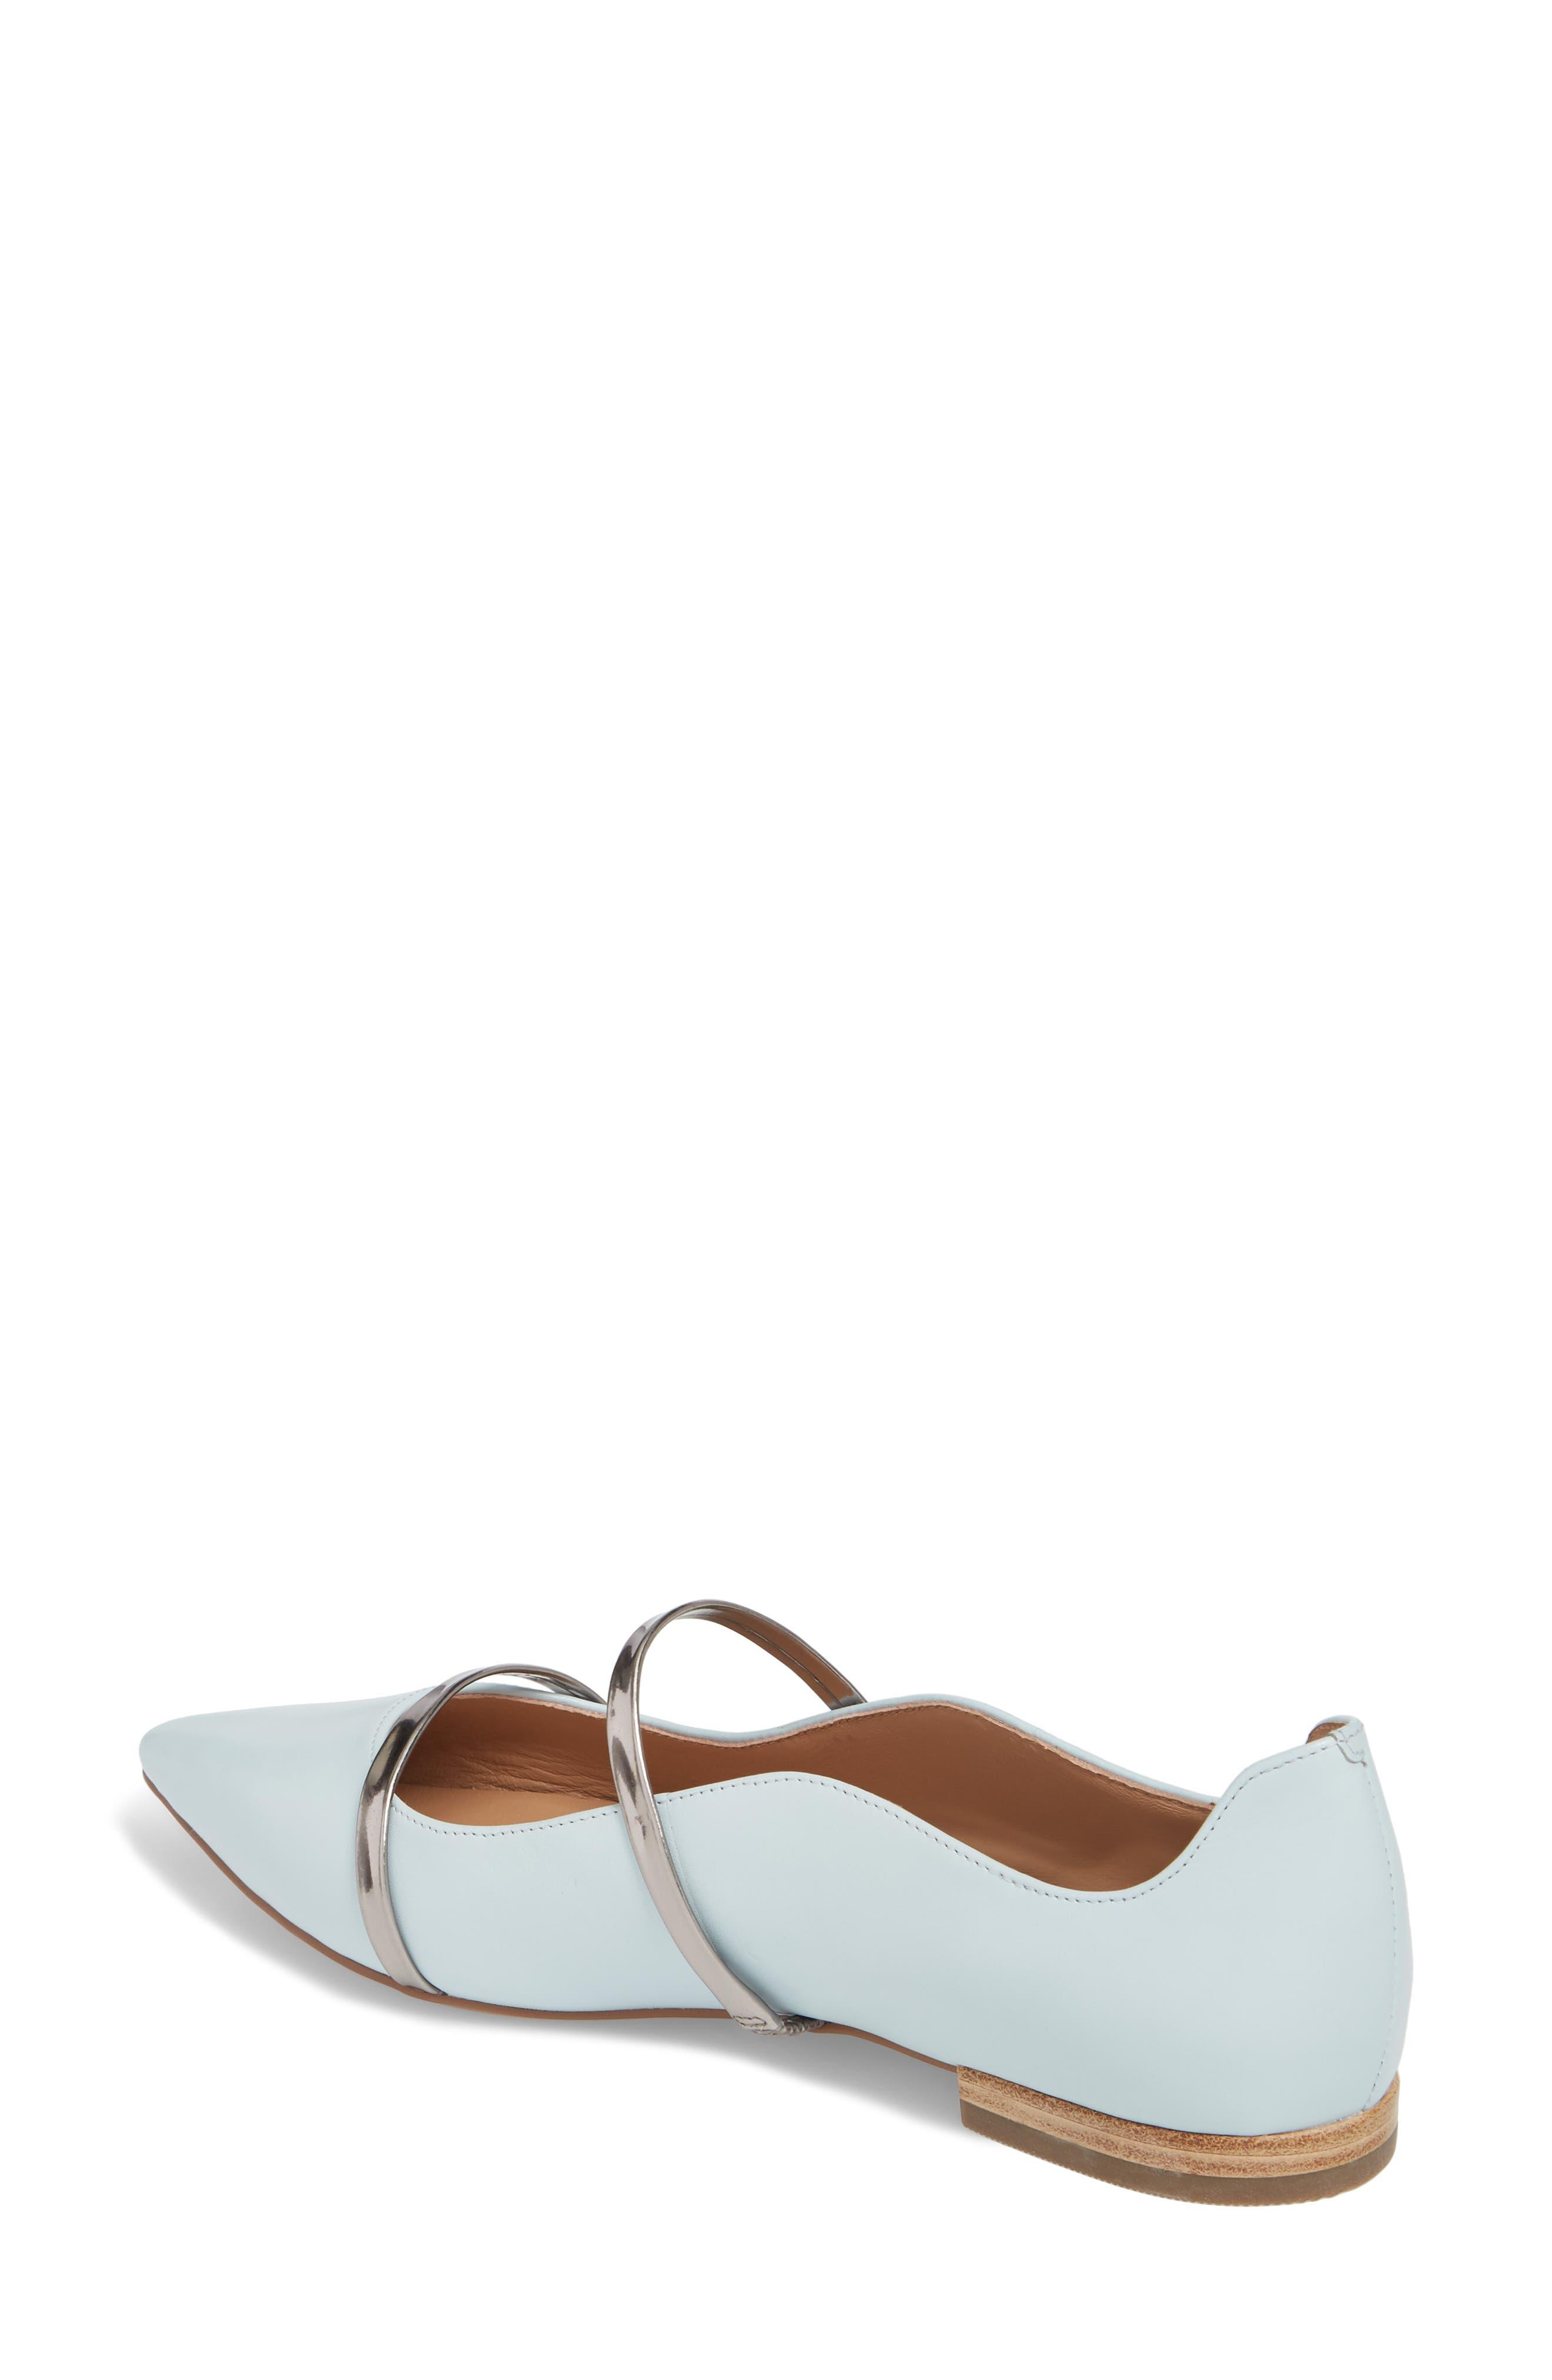 Emily Pointy Toe Flat,                             Alternate thumbnail 2, color,                             Pale Blue/ Gunmetal Leather